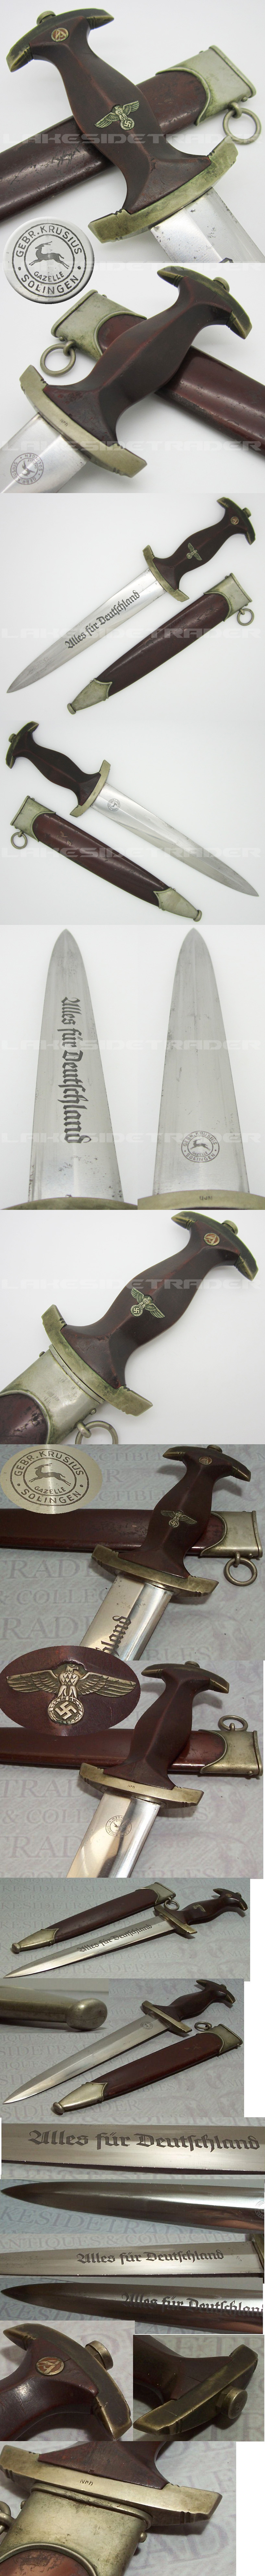 Early SA Dagger by Gebr. Krusius